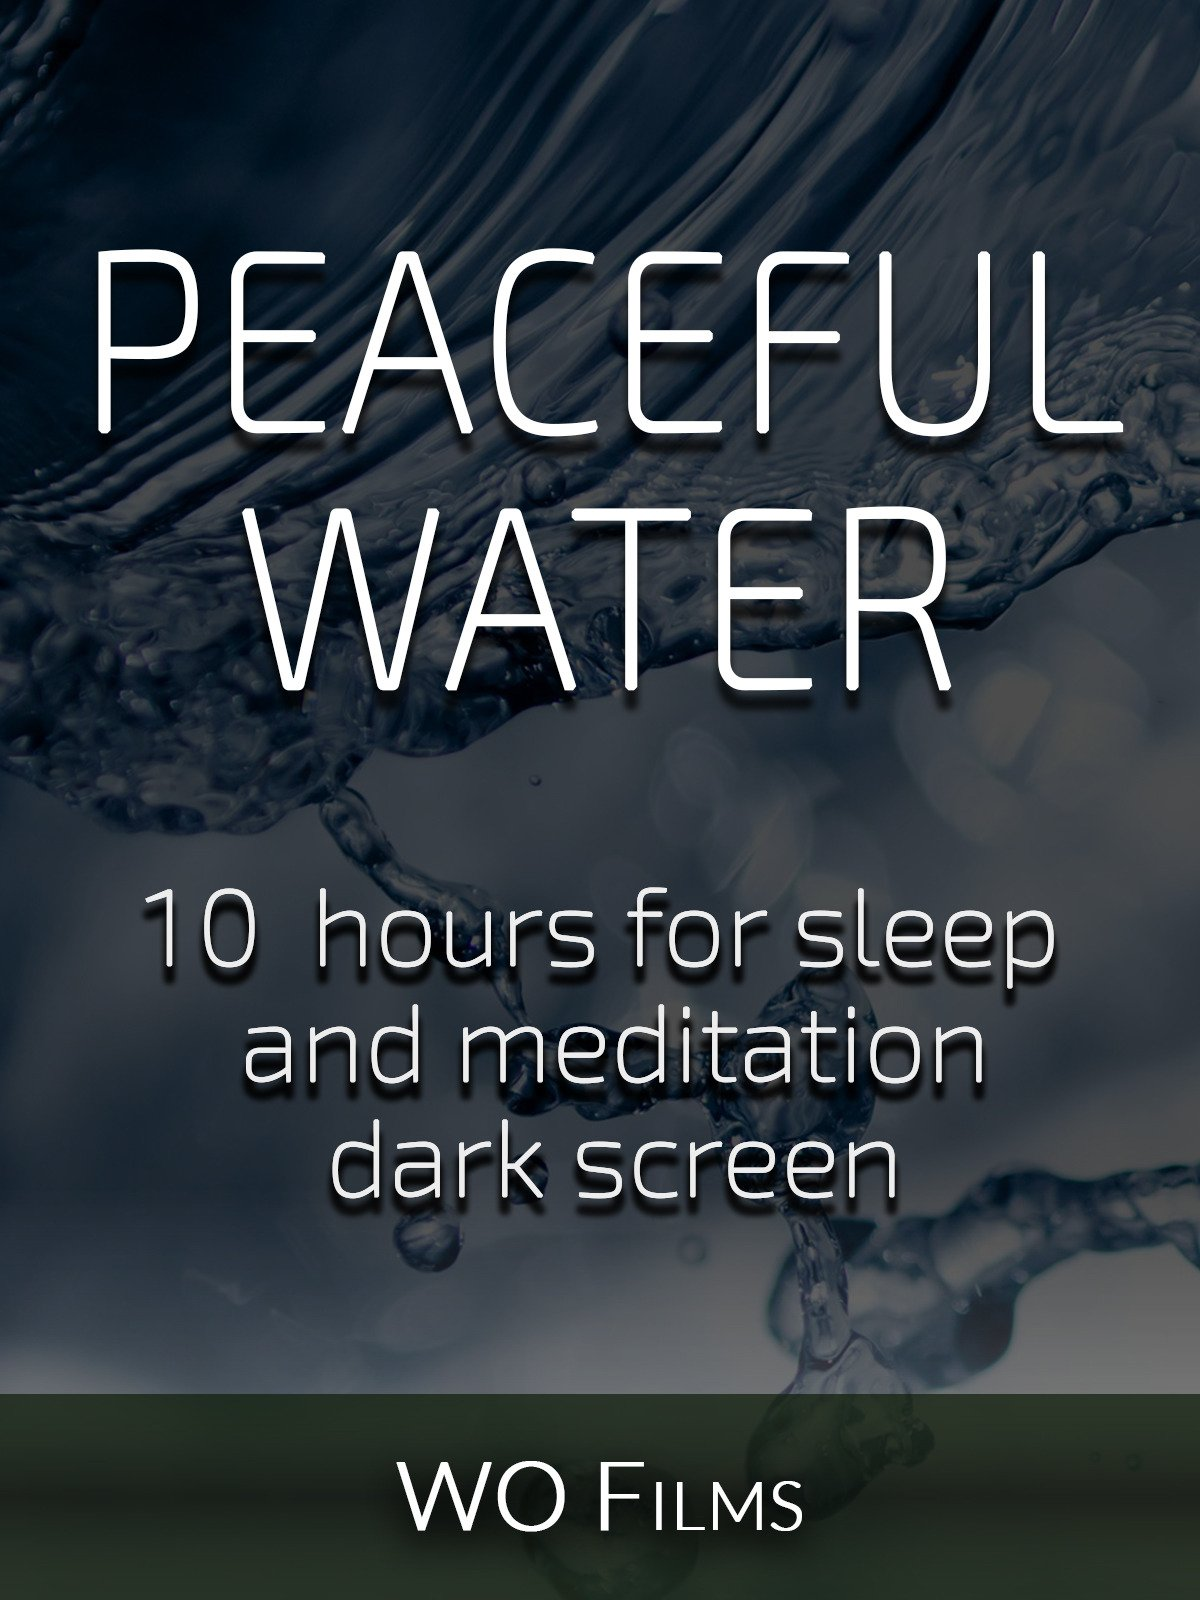 Peaceful water, 10 hours for Sleep and Meditation, dark screen